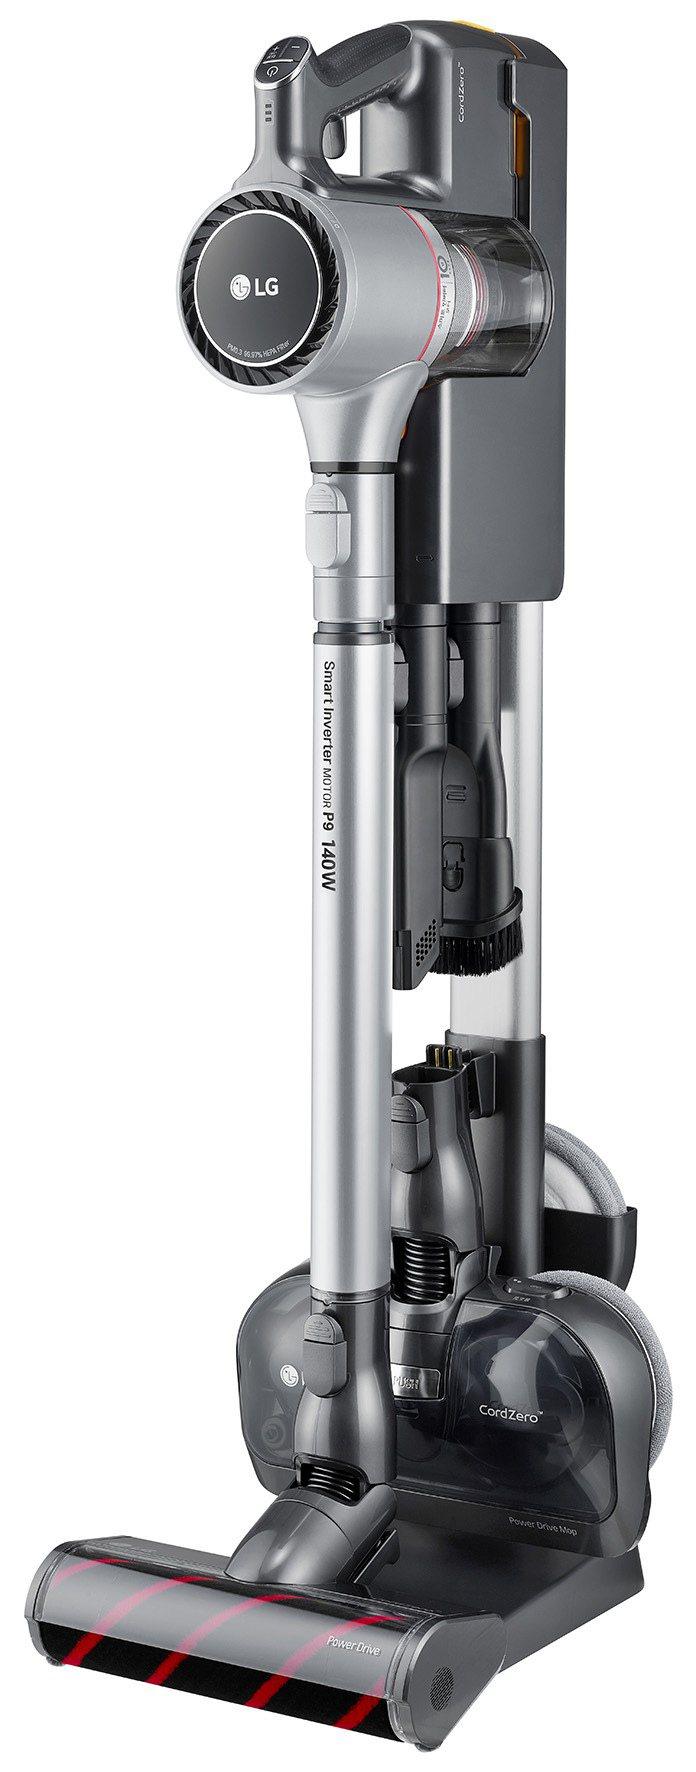 LG CordZero A9+濕拖無線吸塵器,市價24,900元、全國電子周年慶...